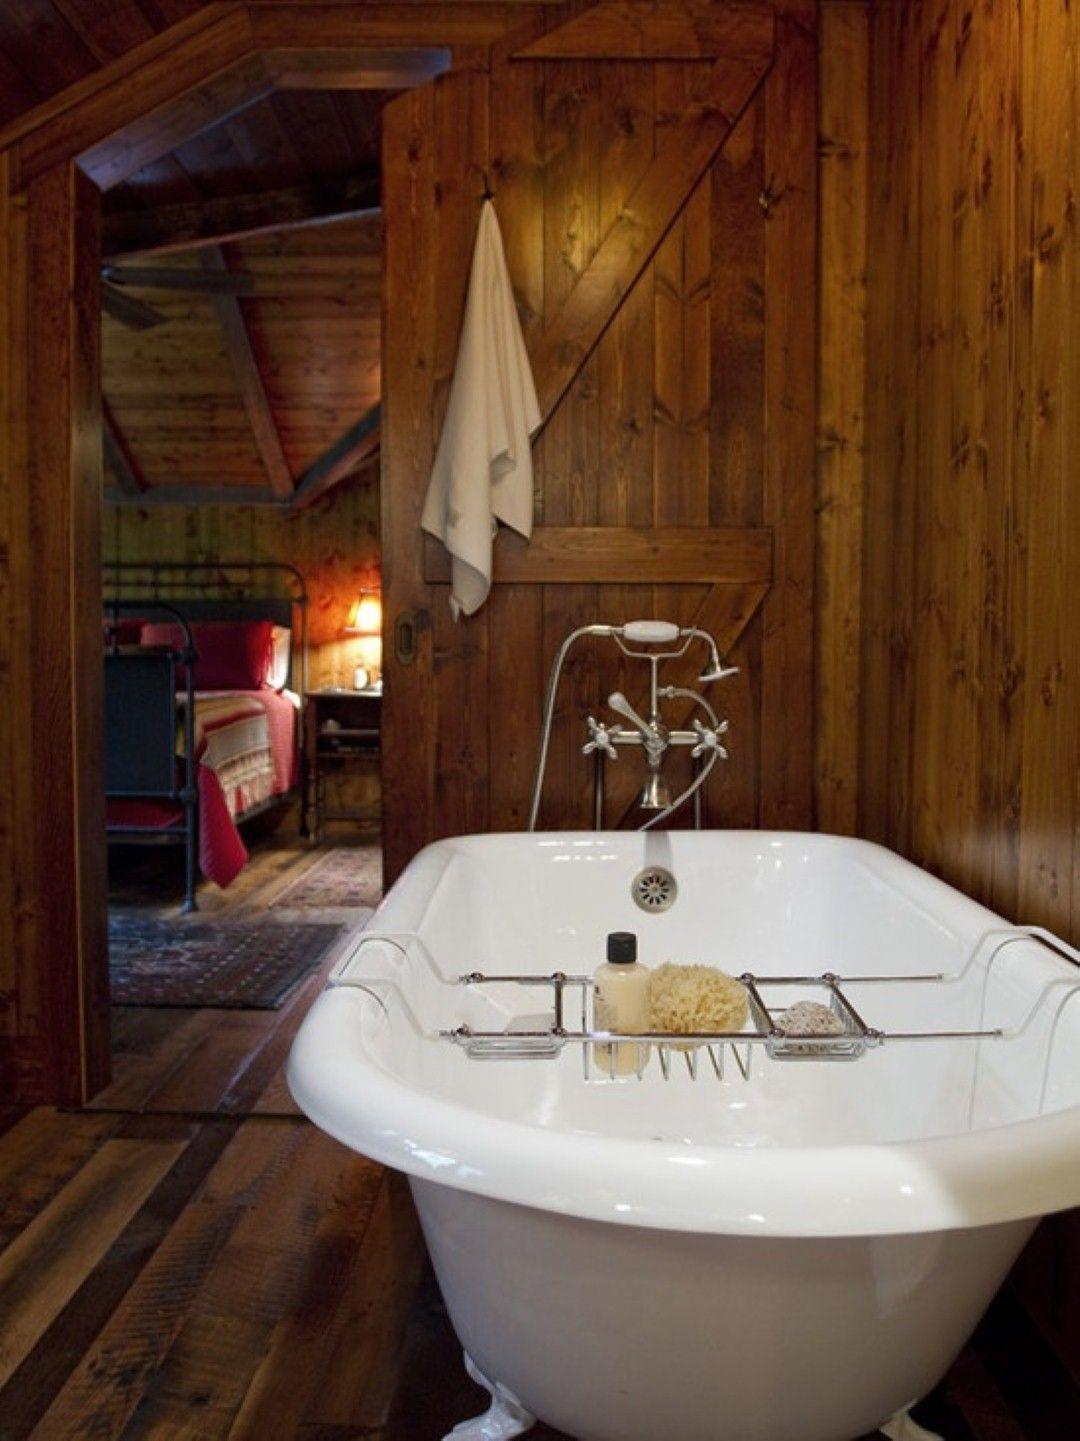 Rustic Bathroom Designs Rustic Bathroom Designs